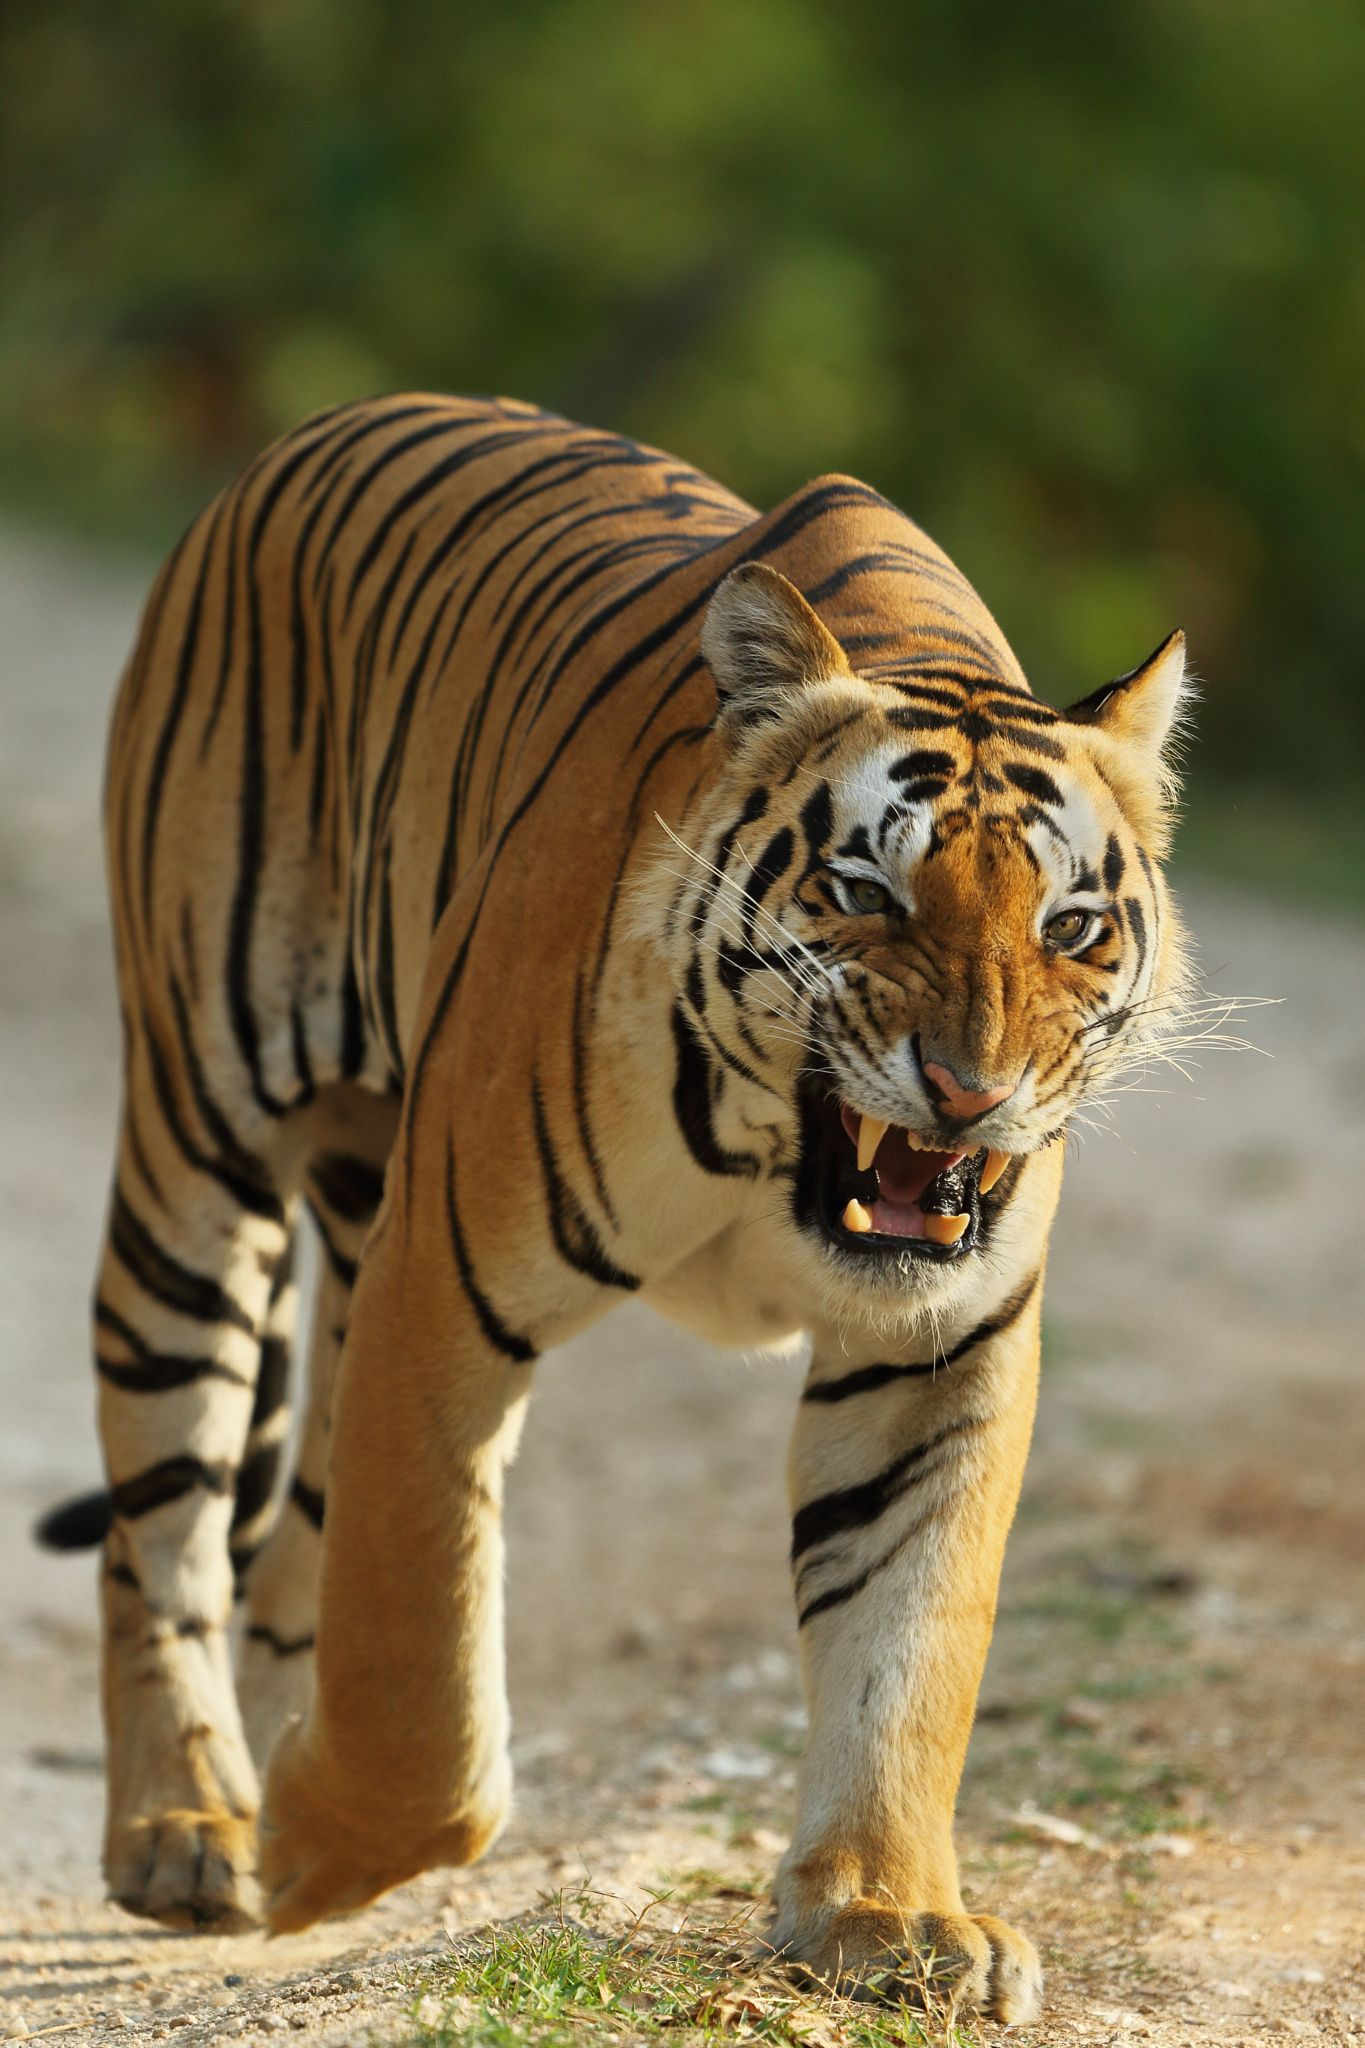 Showing Teeth by Sarosh Lodhi on 500px